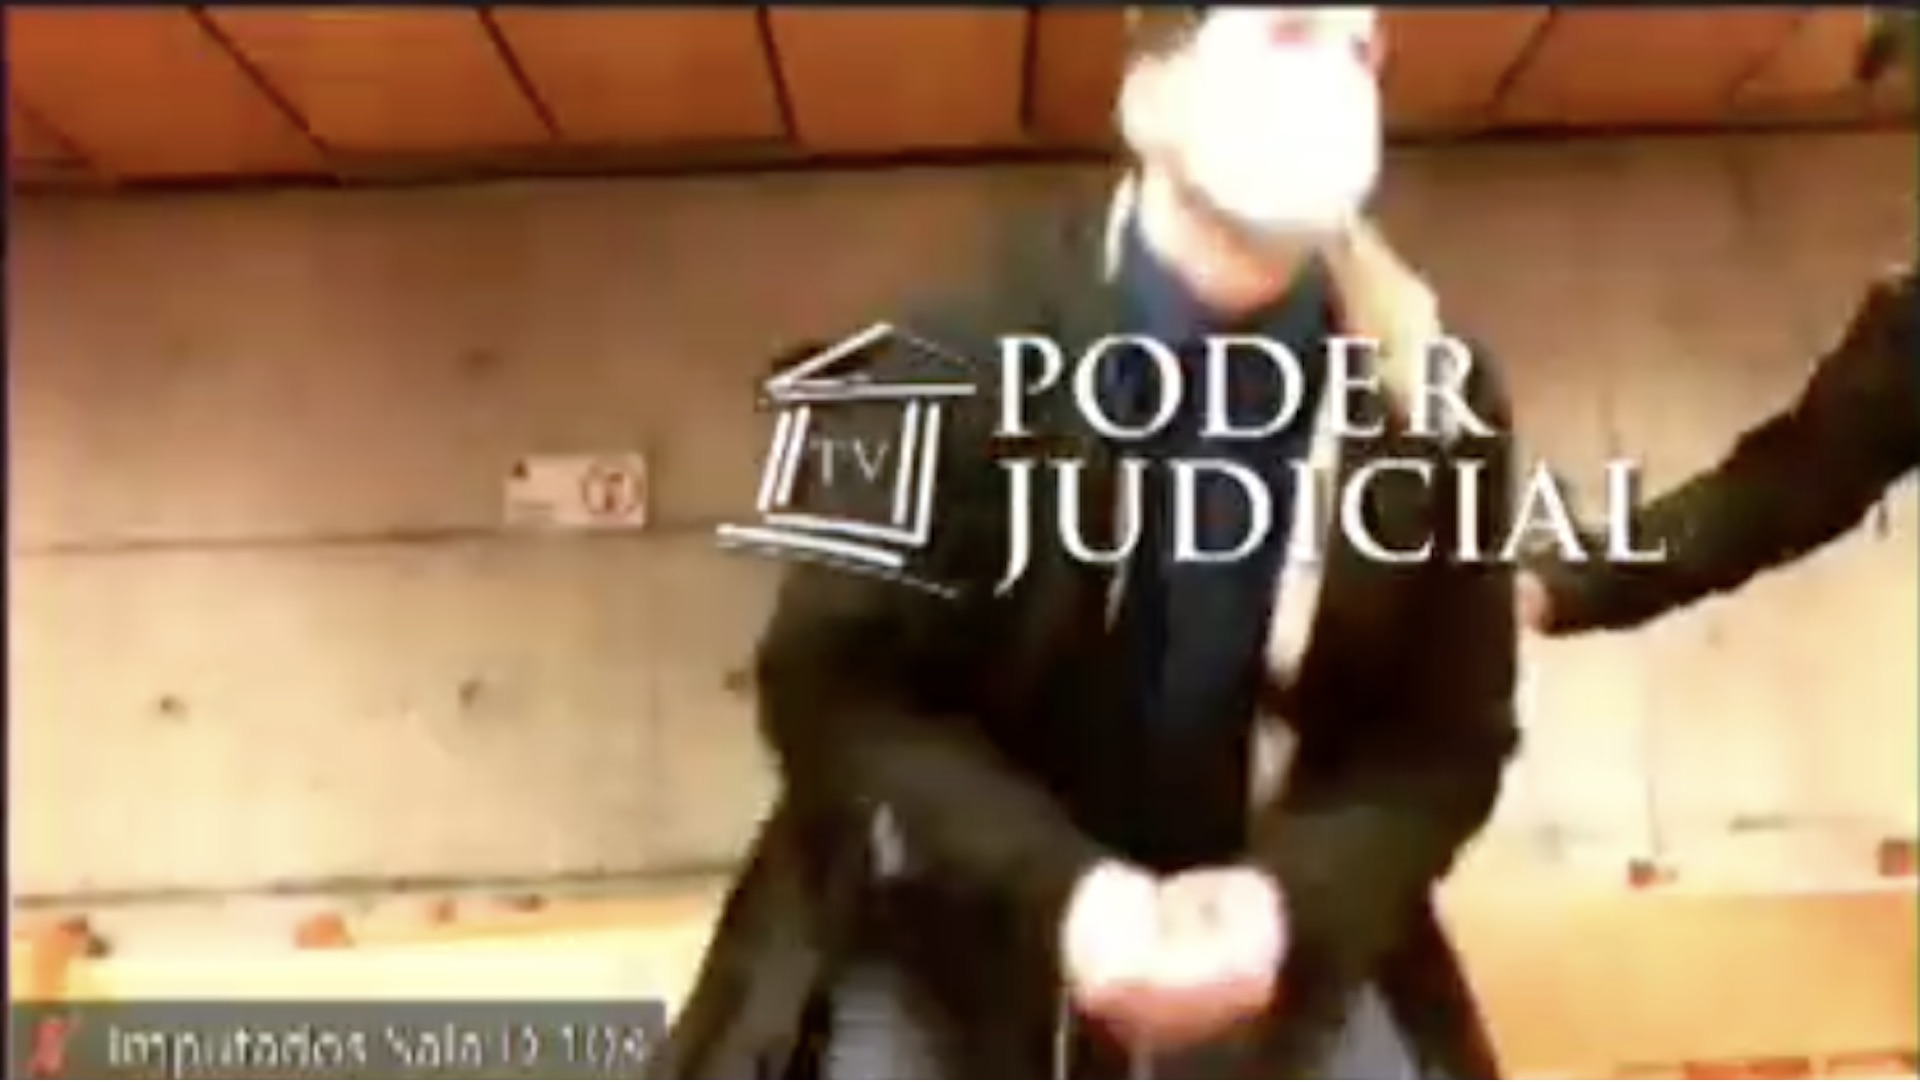 Prisión preventiva para Nano Calderón: será enviado primero a clínica psiquiátrica